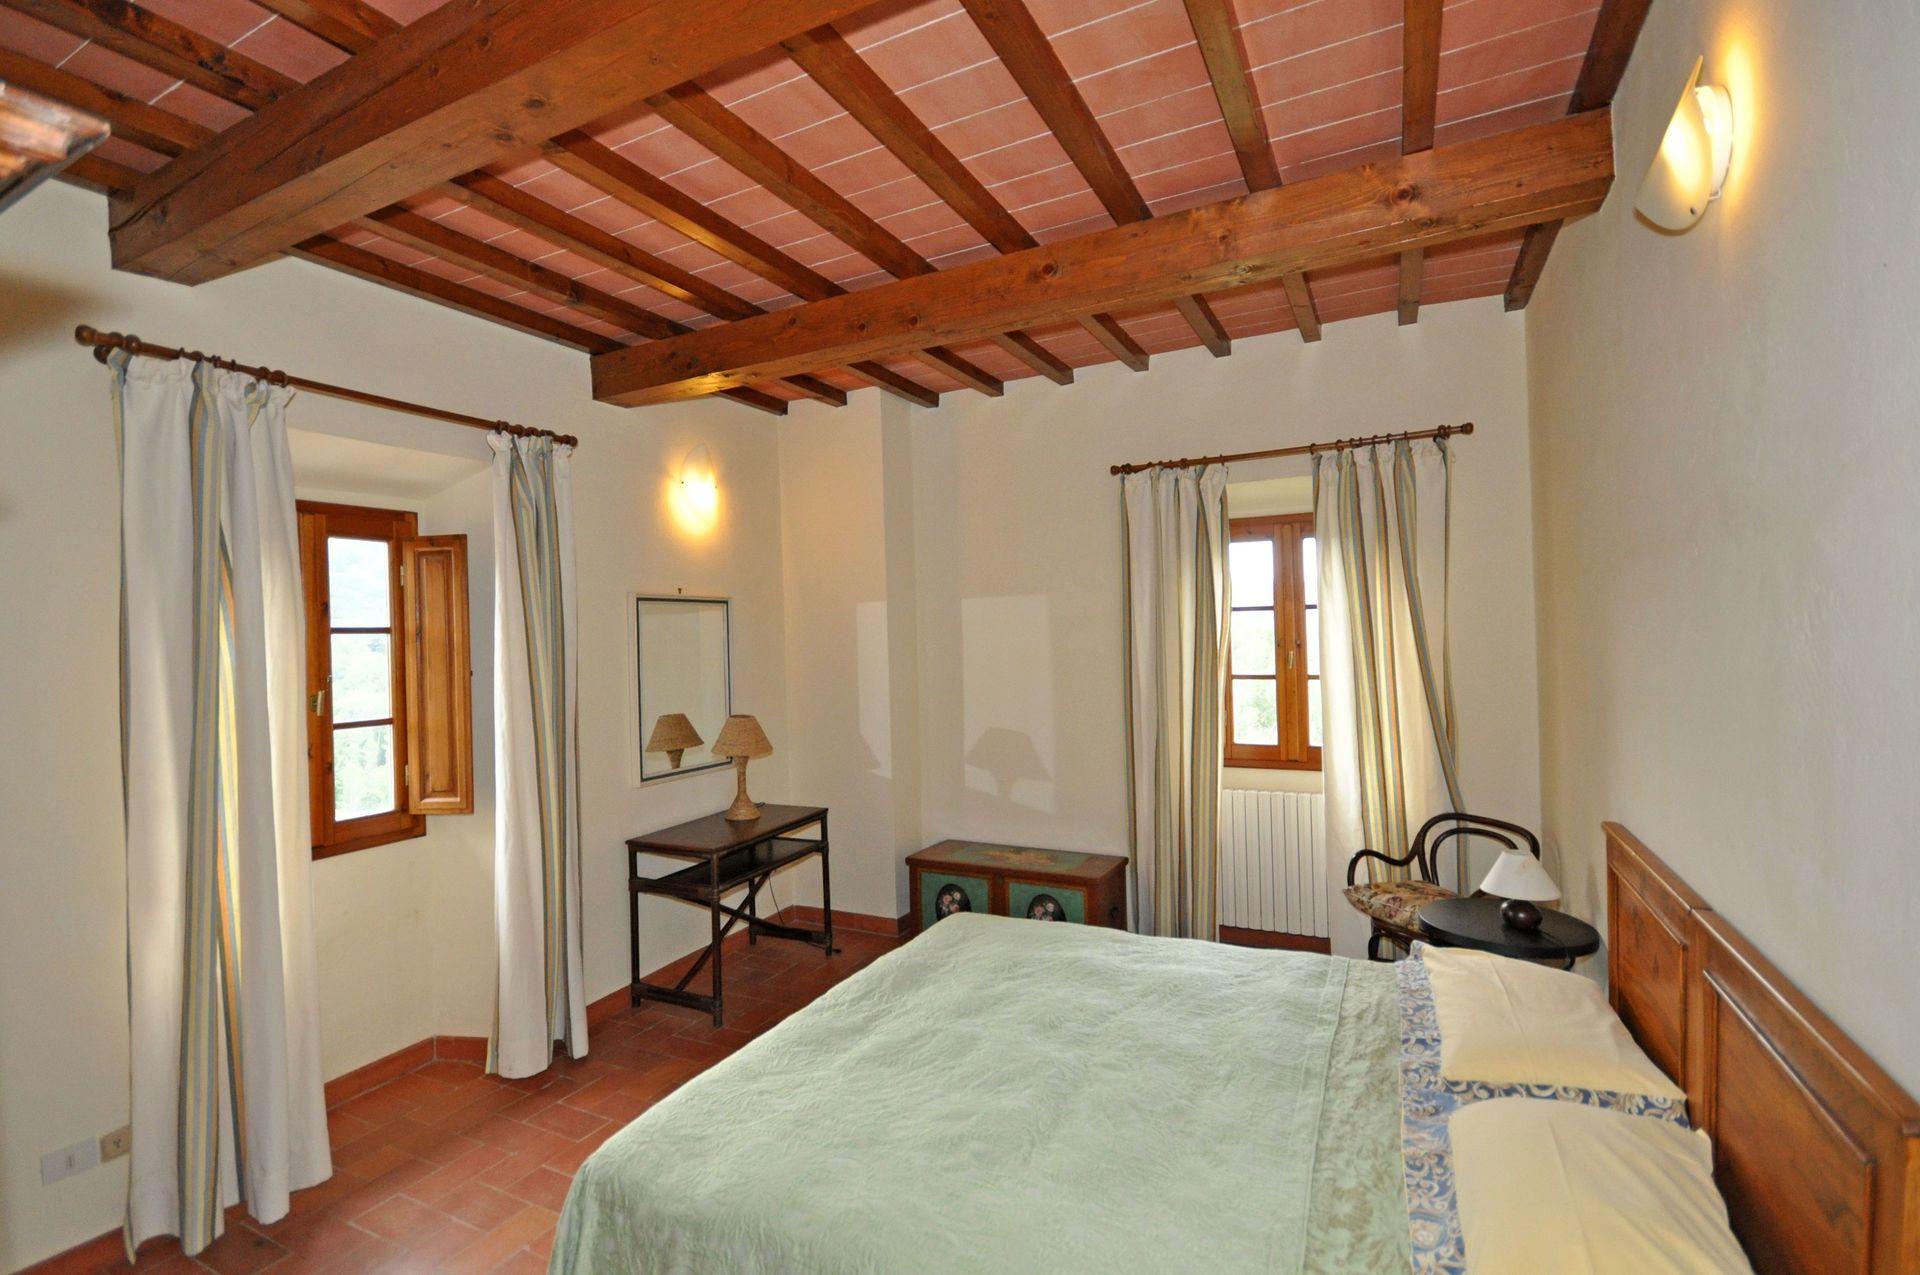 Bagno a Ripoli Villa Vacation Rental Villa Terrazza that sleeps 16 ...